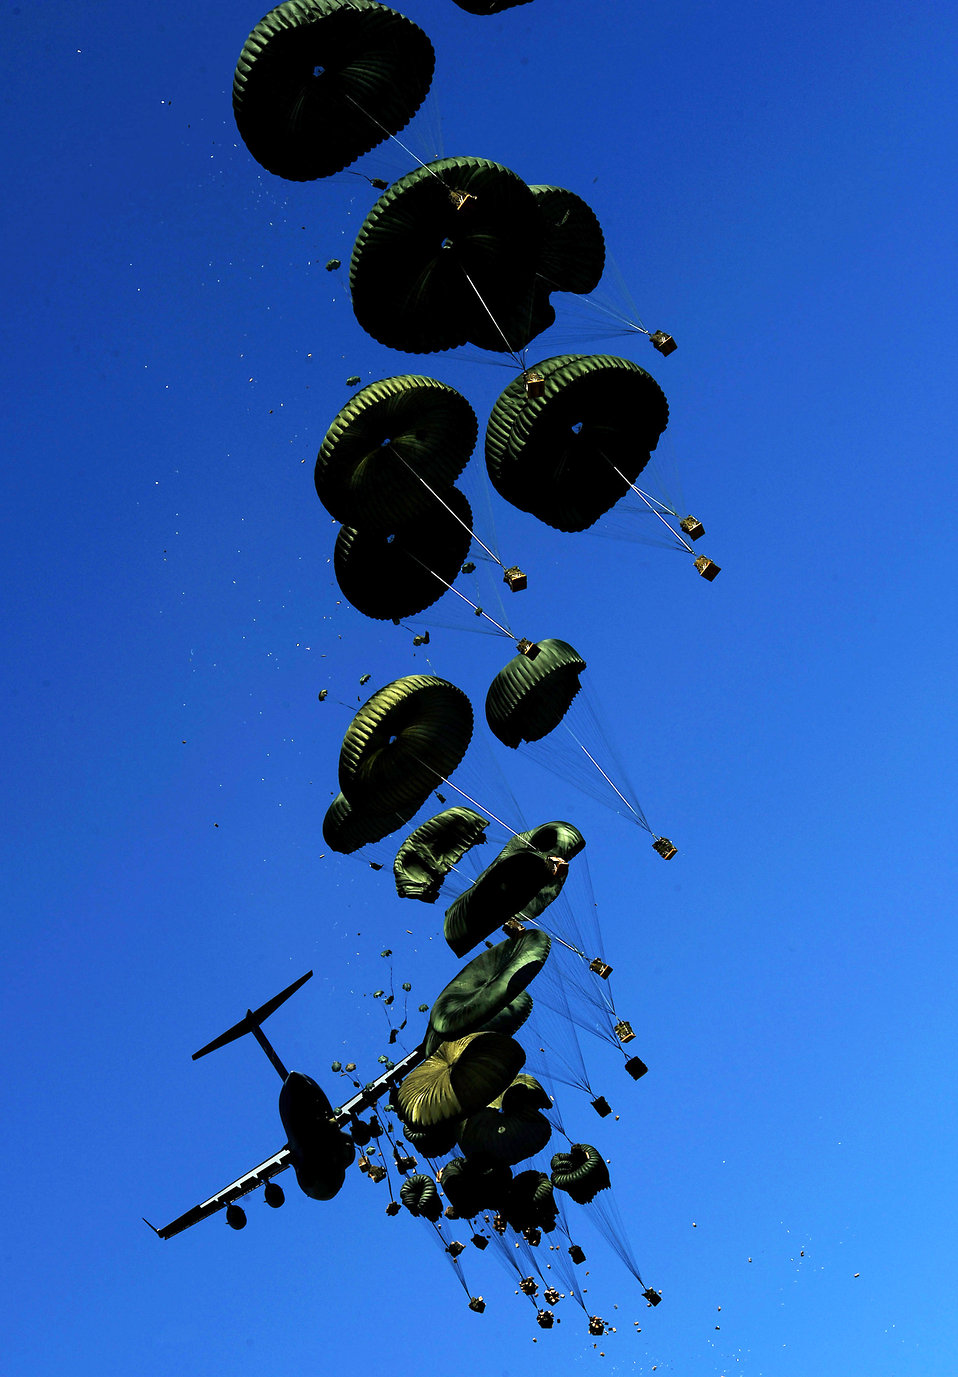 Airmen airdrop relief supplies to Haitians